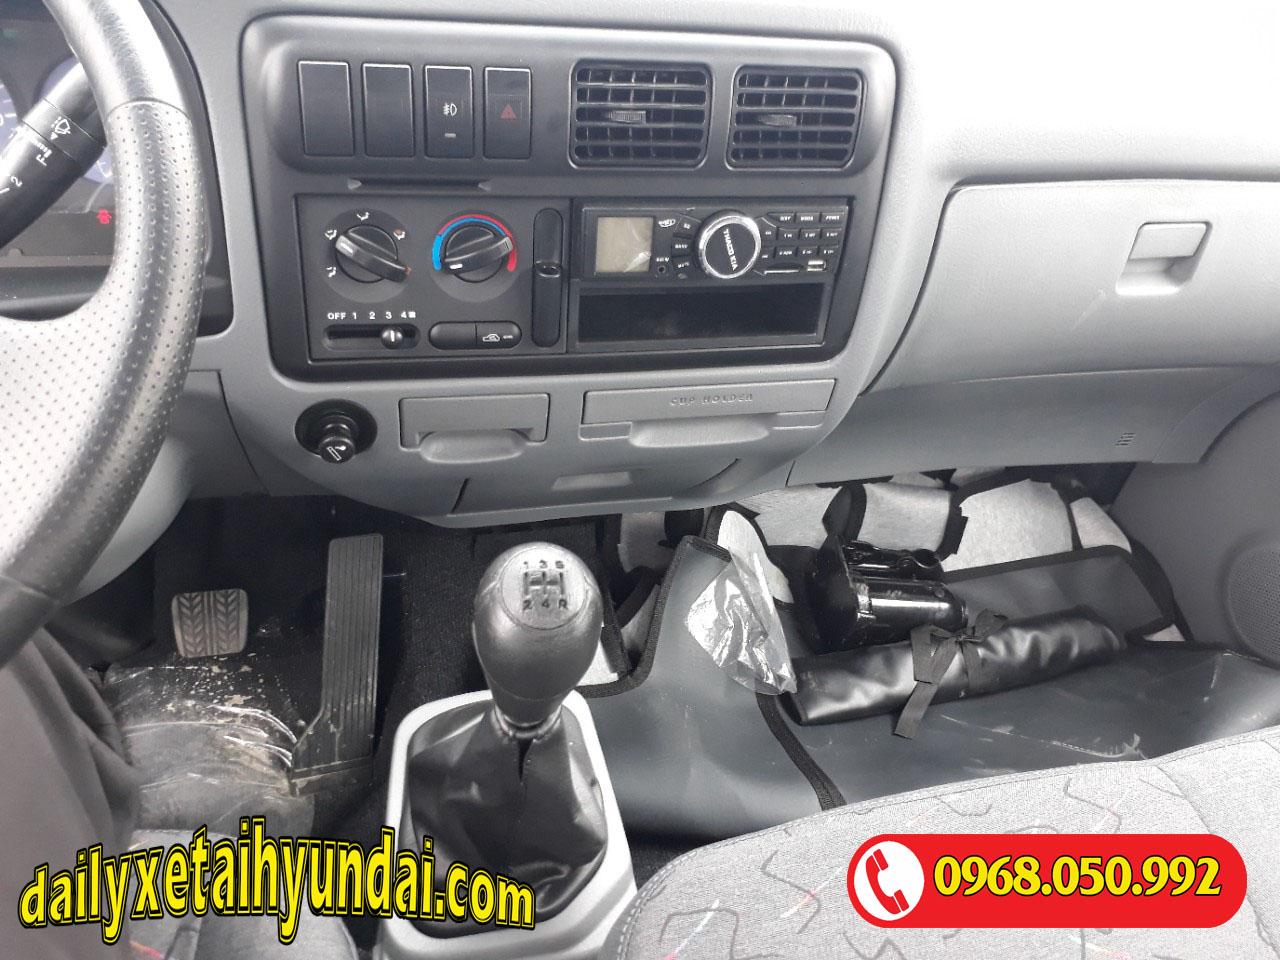 Nội thất xe Thaco